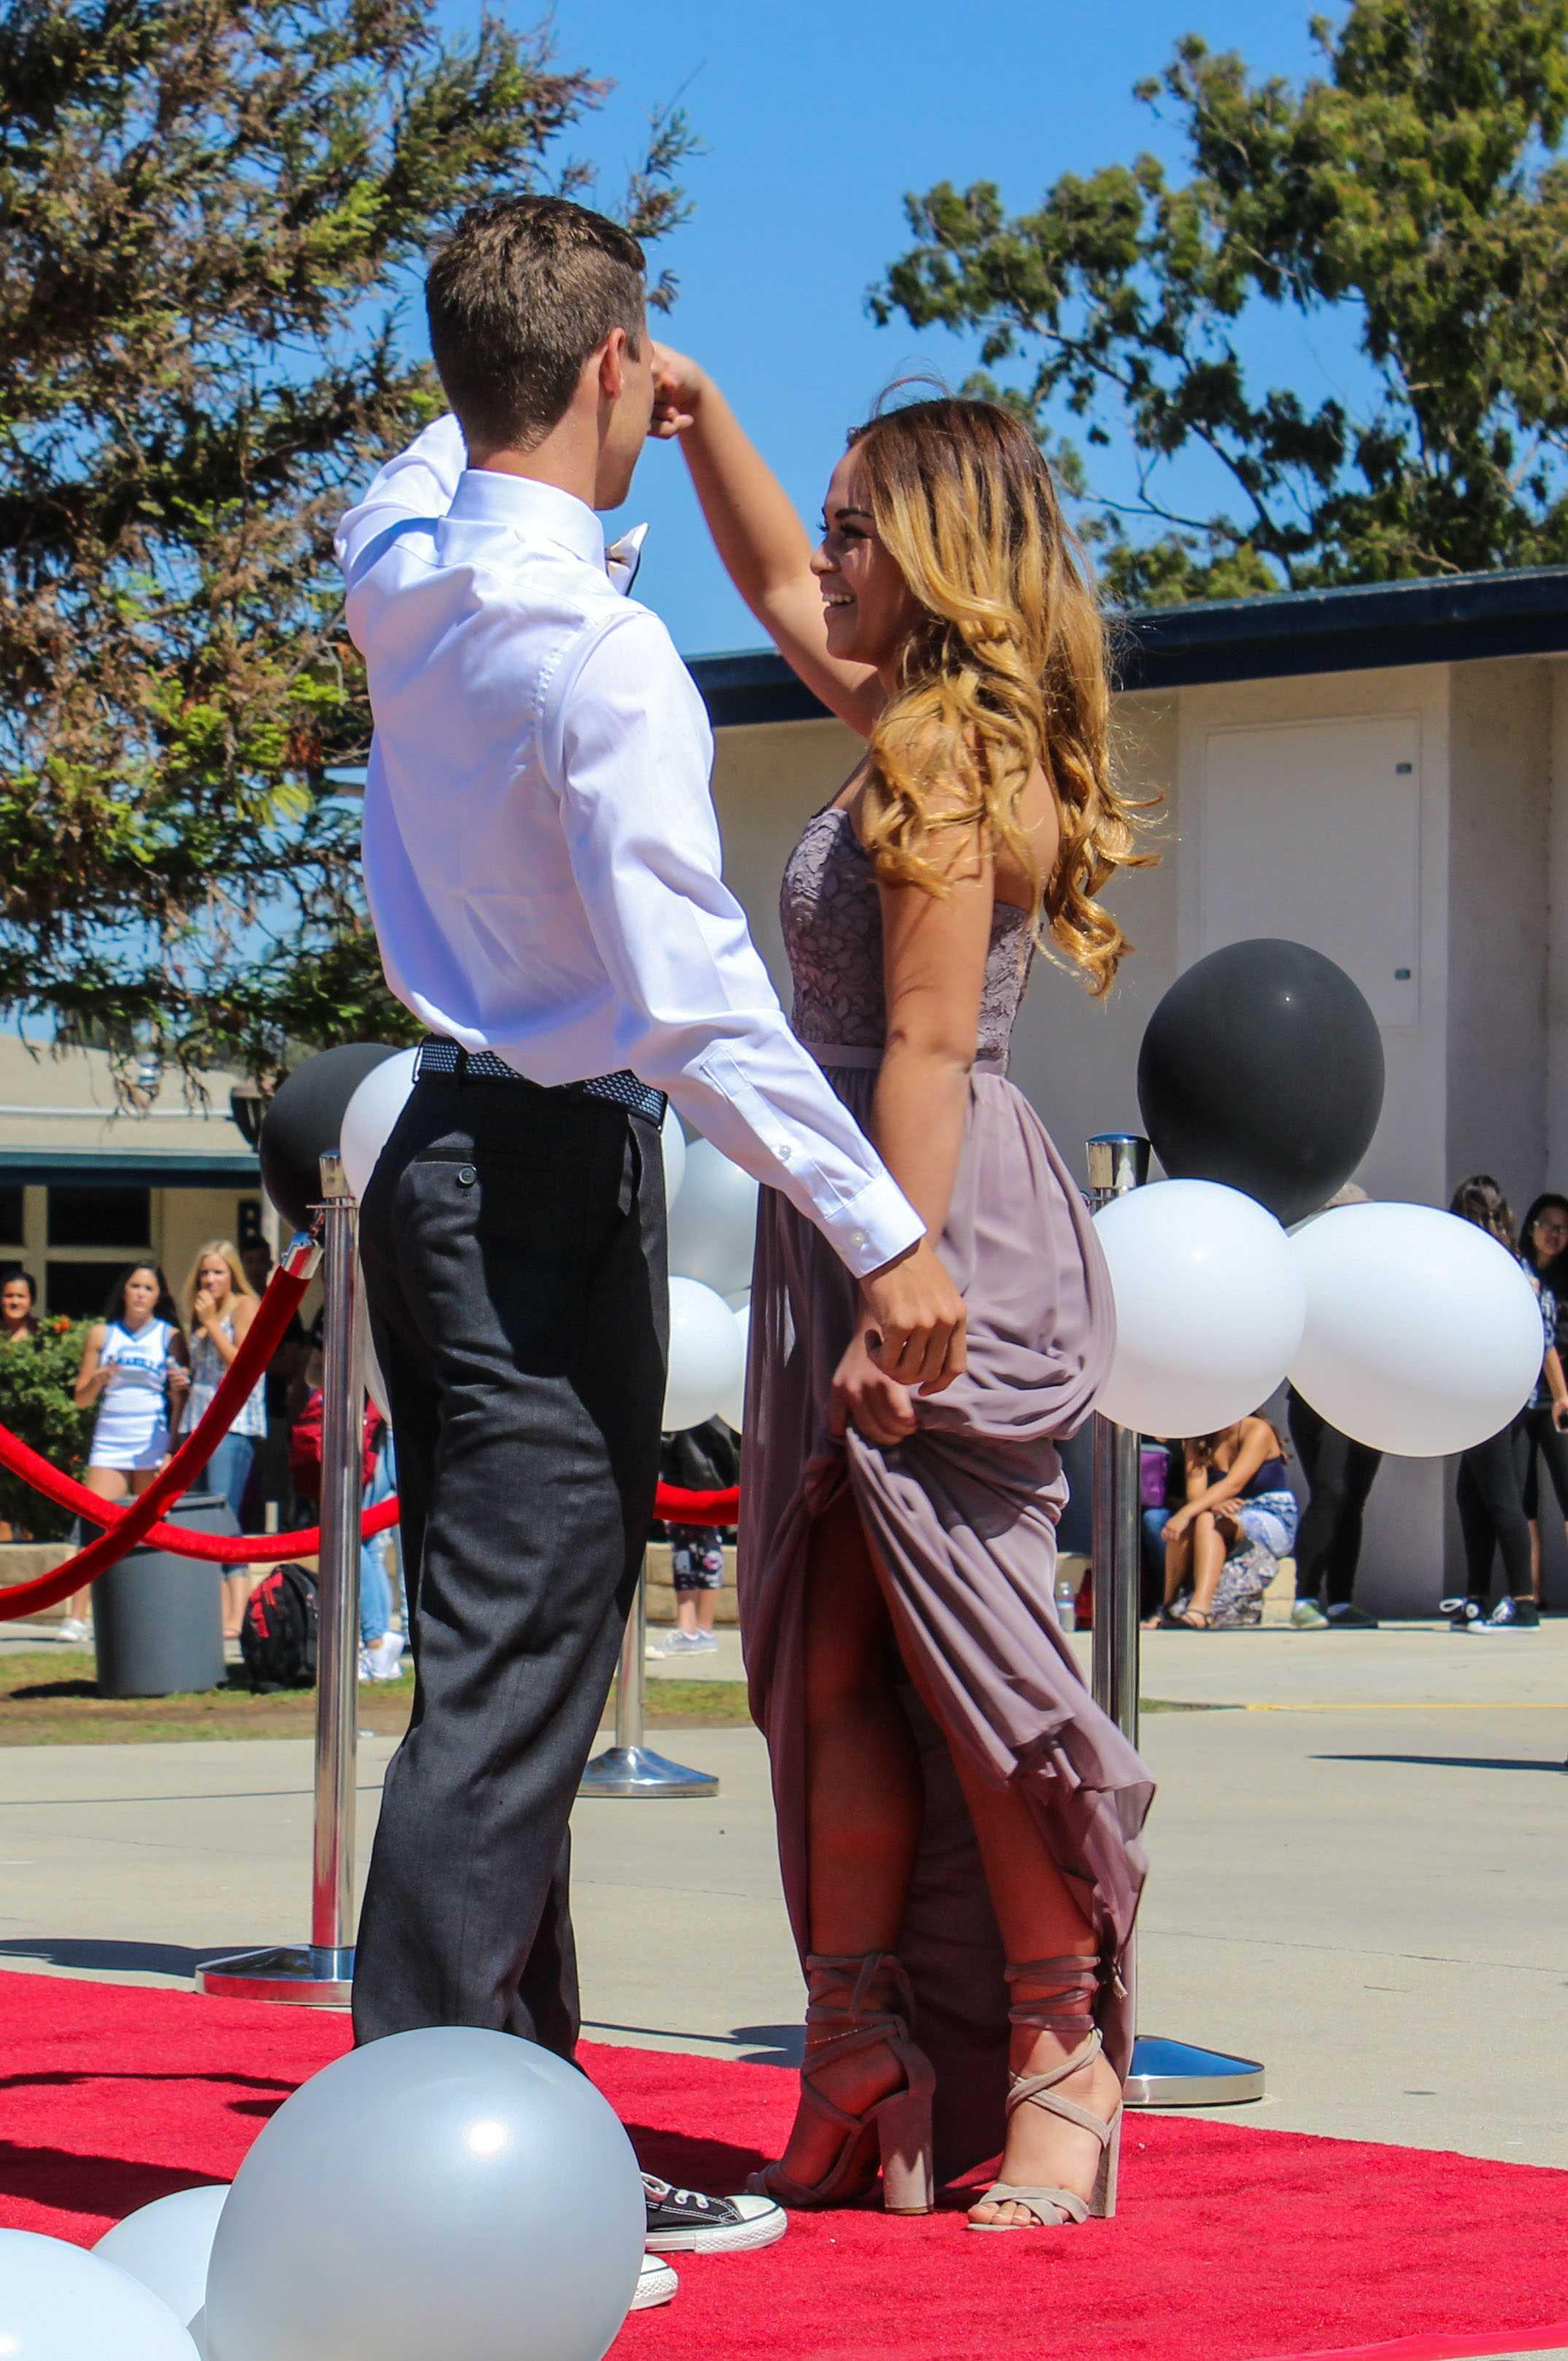 Hunter Davidson (senior) & Mia Fernandez (senior)